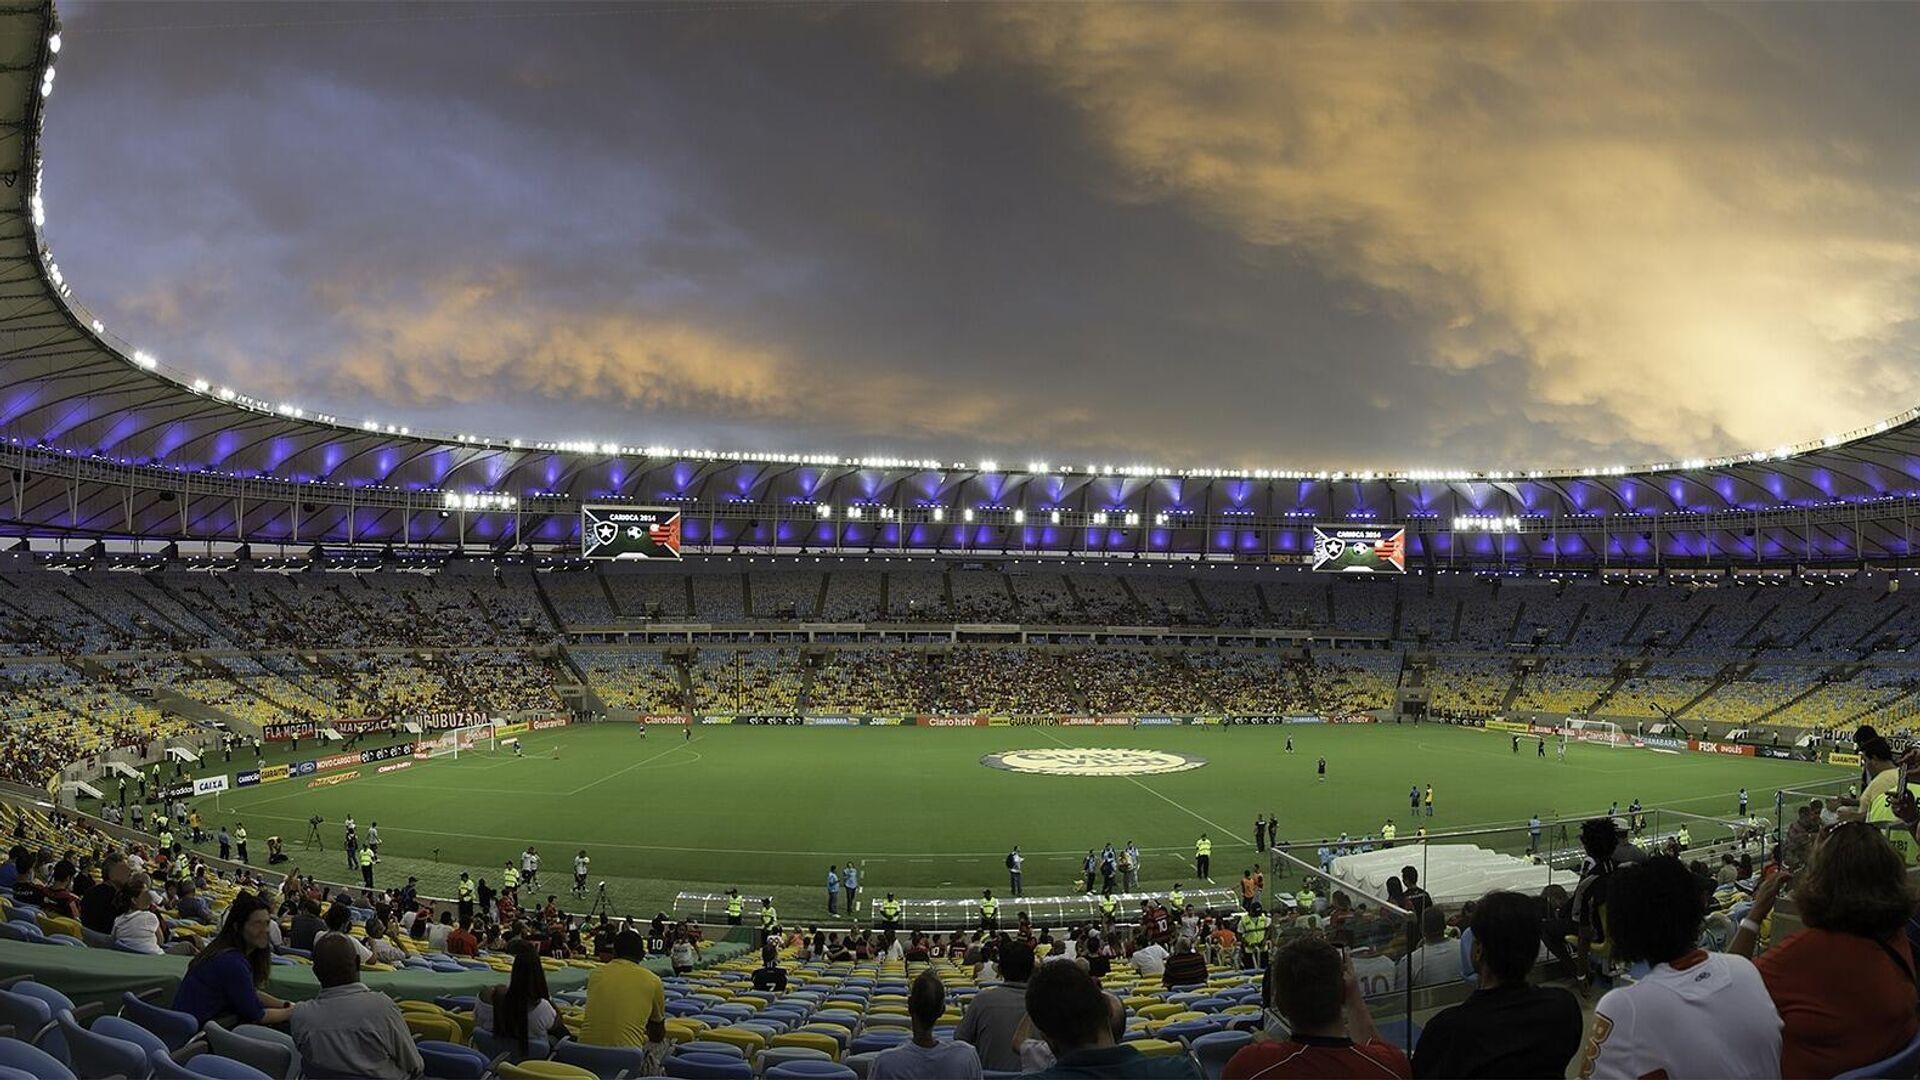 Стадион Маракана - РИА Новости, 1920, 31.05.2021